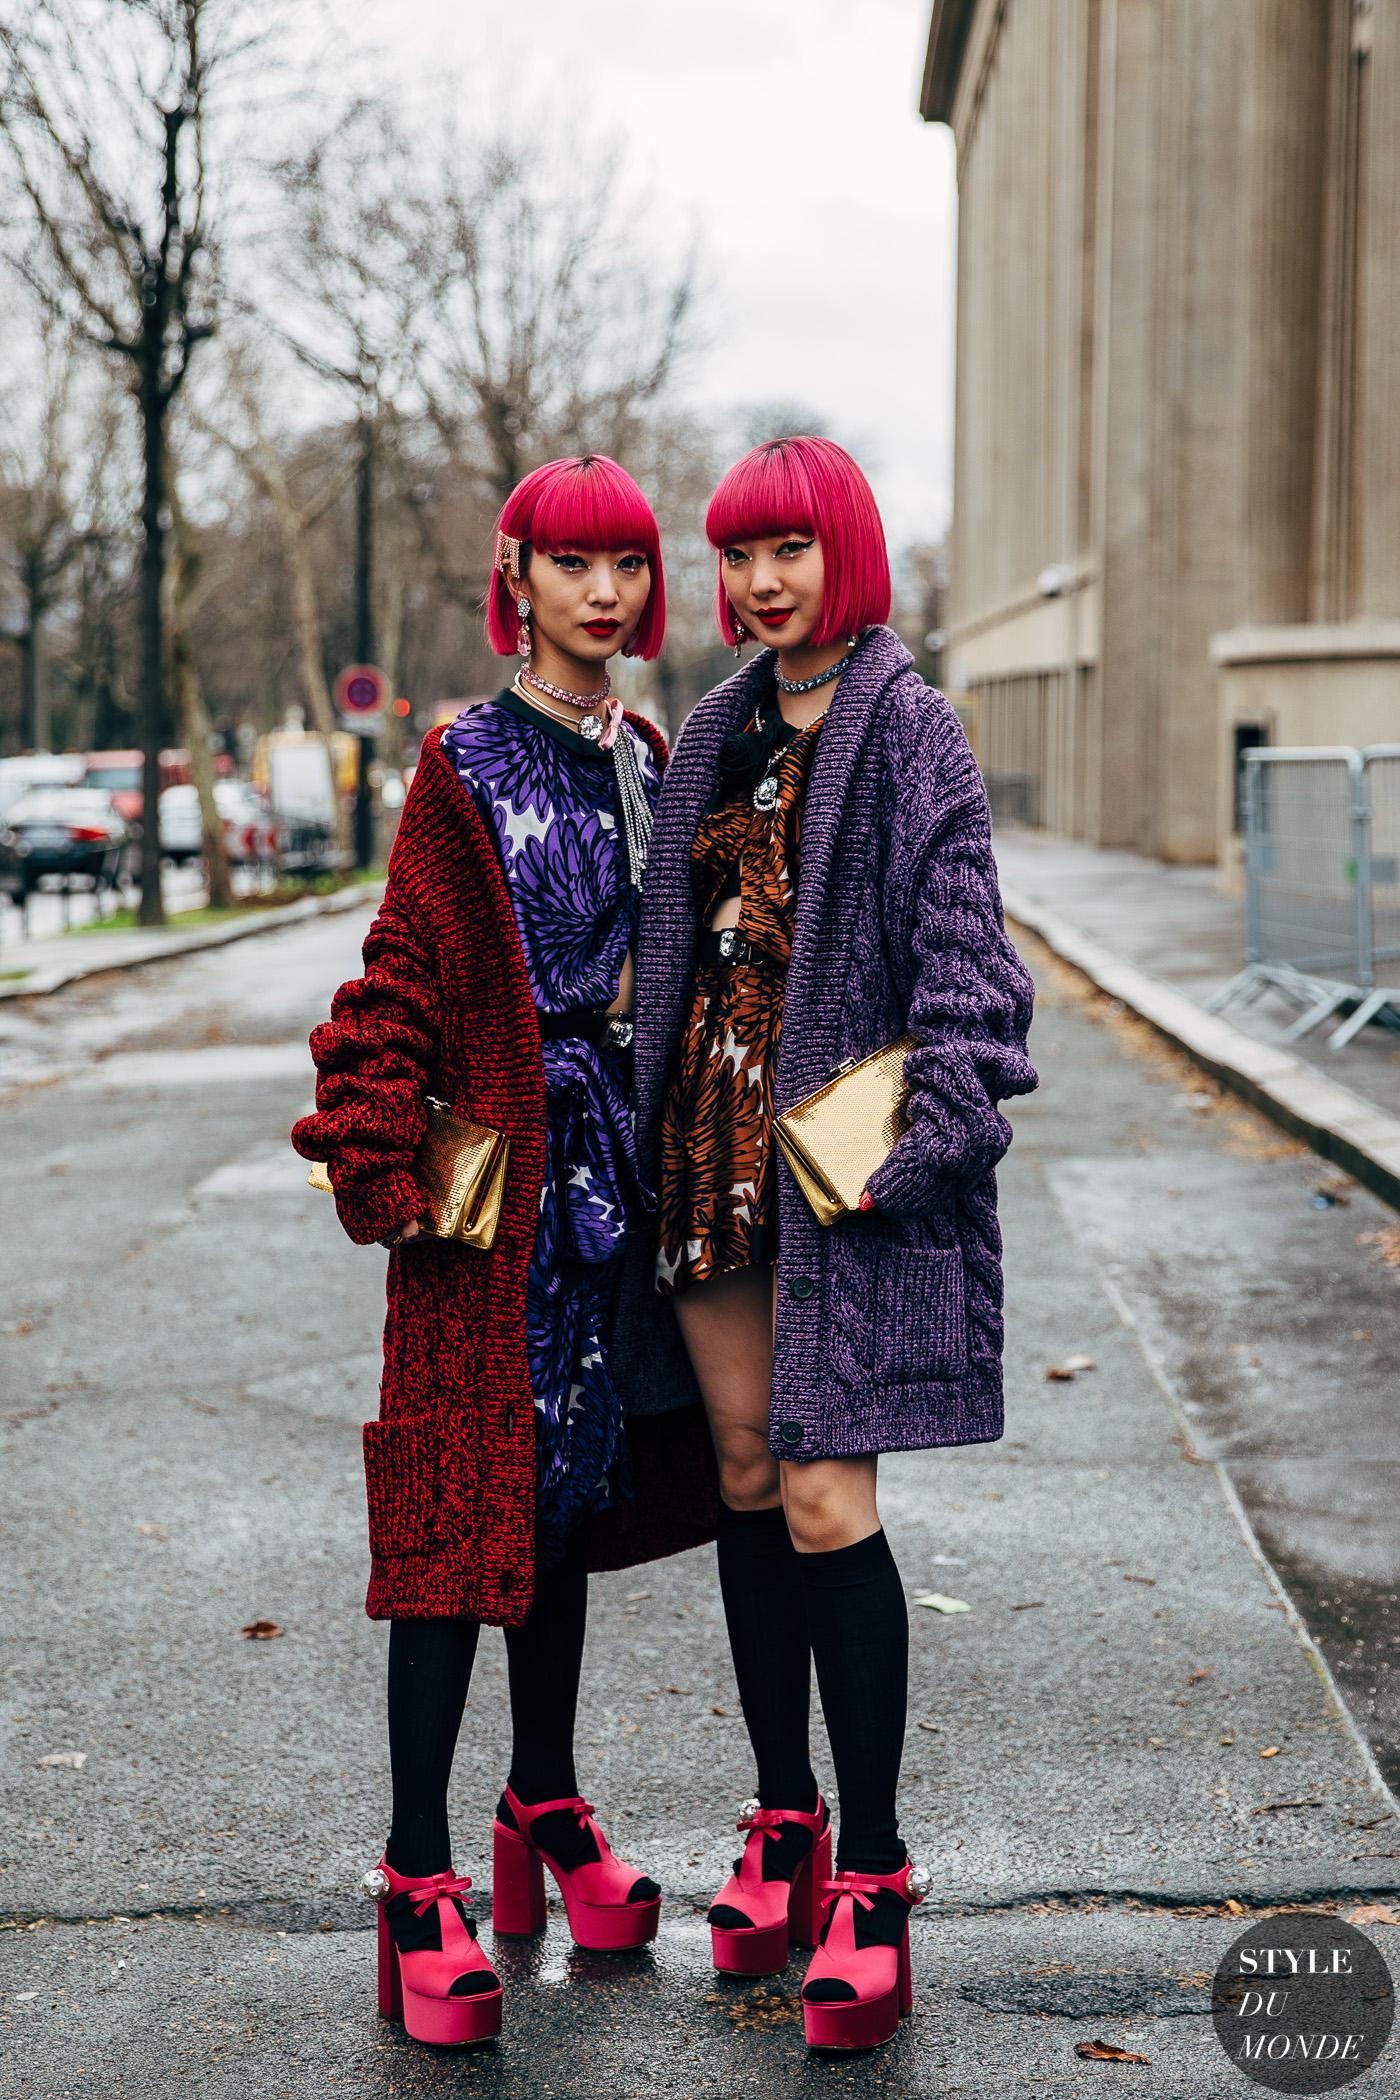 Paris FW 2020 Street Style: Ami and Aya